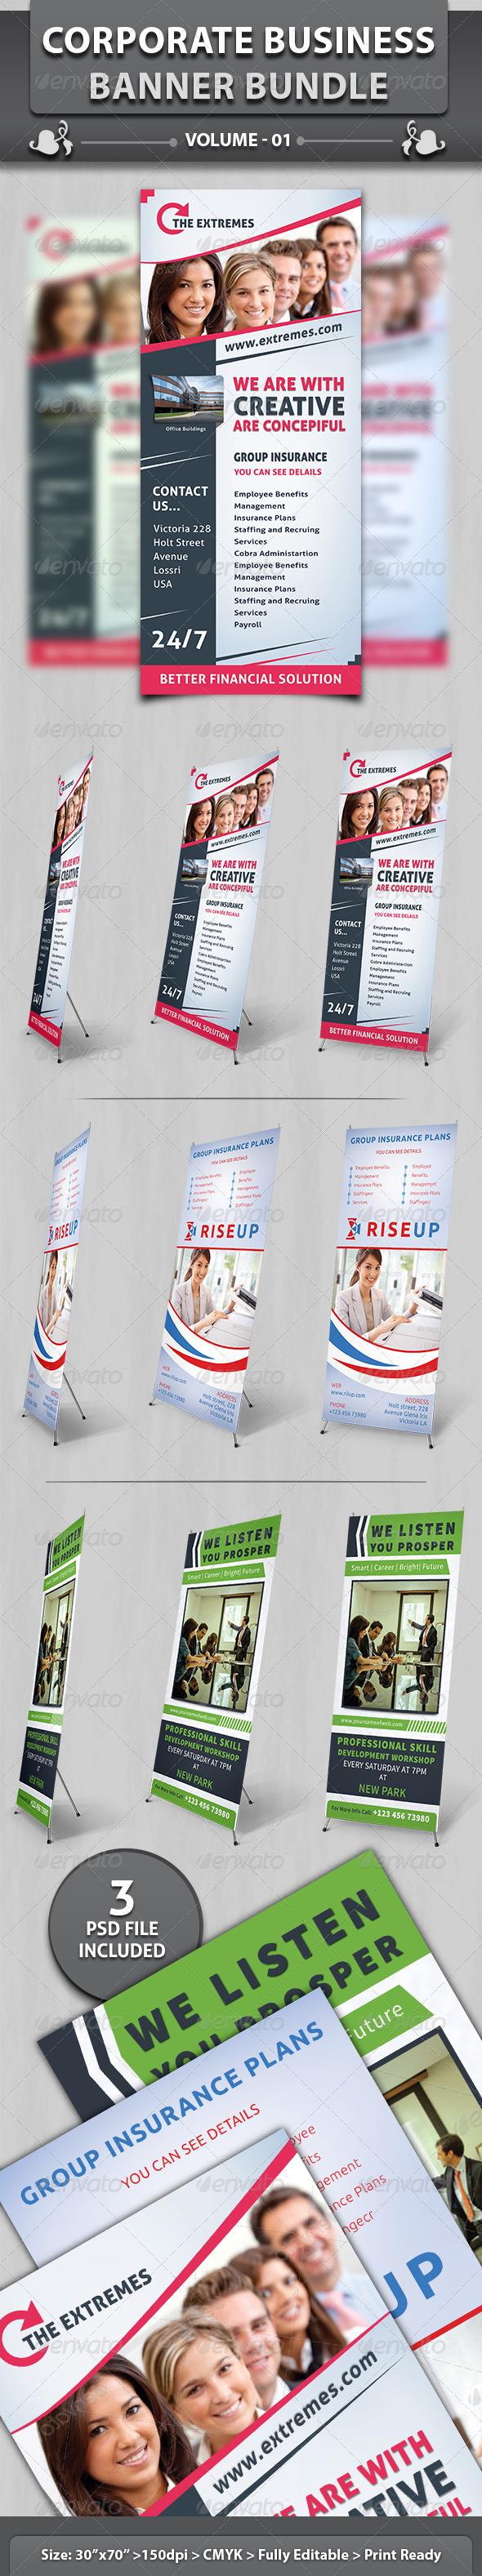 GraphicRiver Corporate Business Banner Bundle v1 5326600